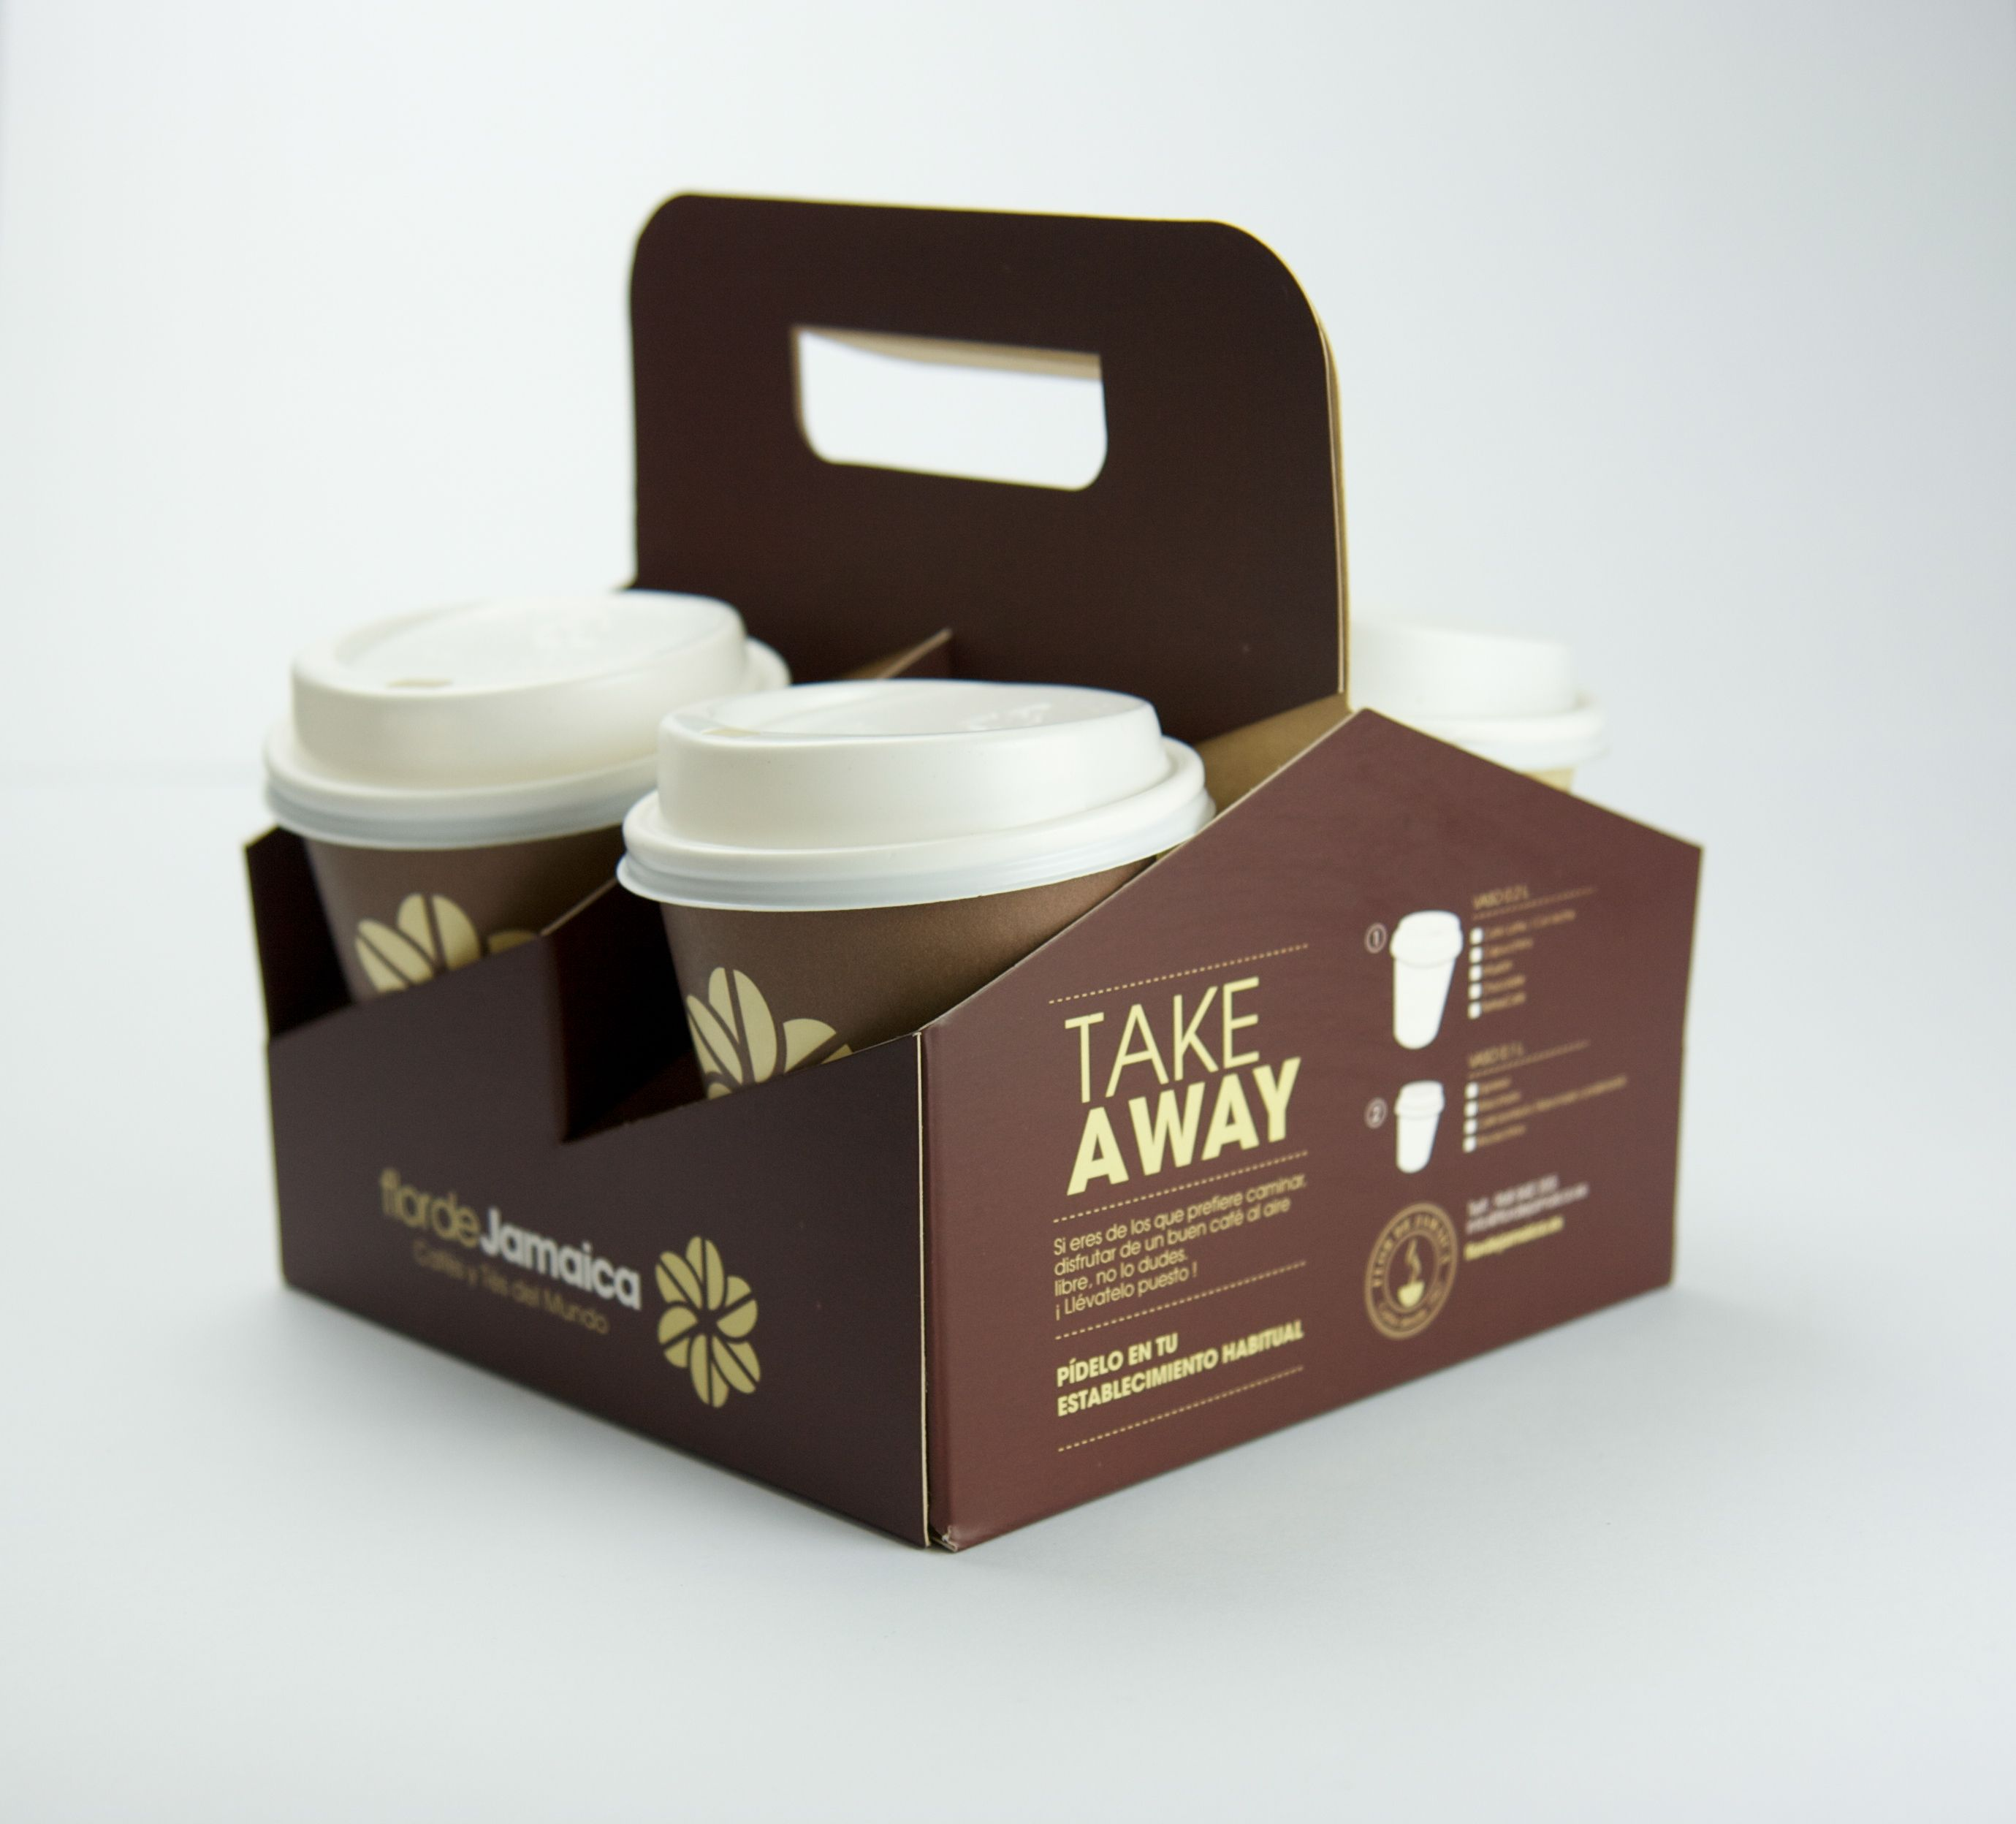 Take away flor de jamaica coffee flor de jamaica coffee tea y - Envases take away ...